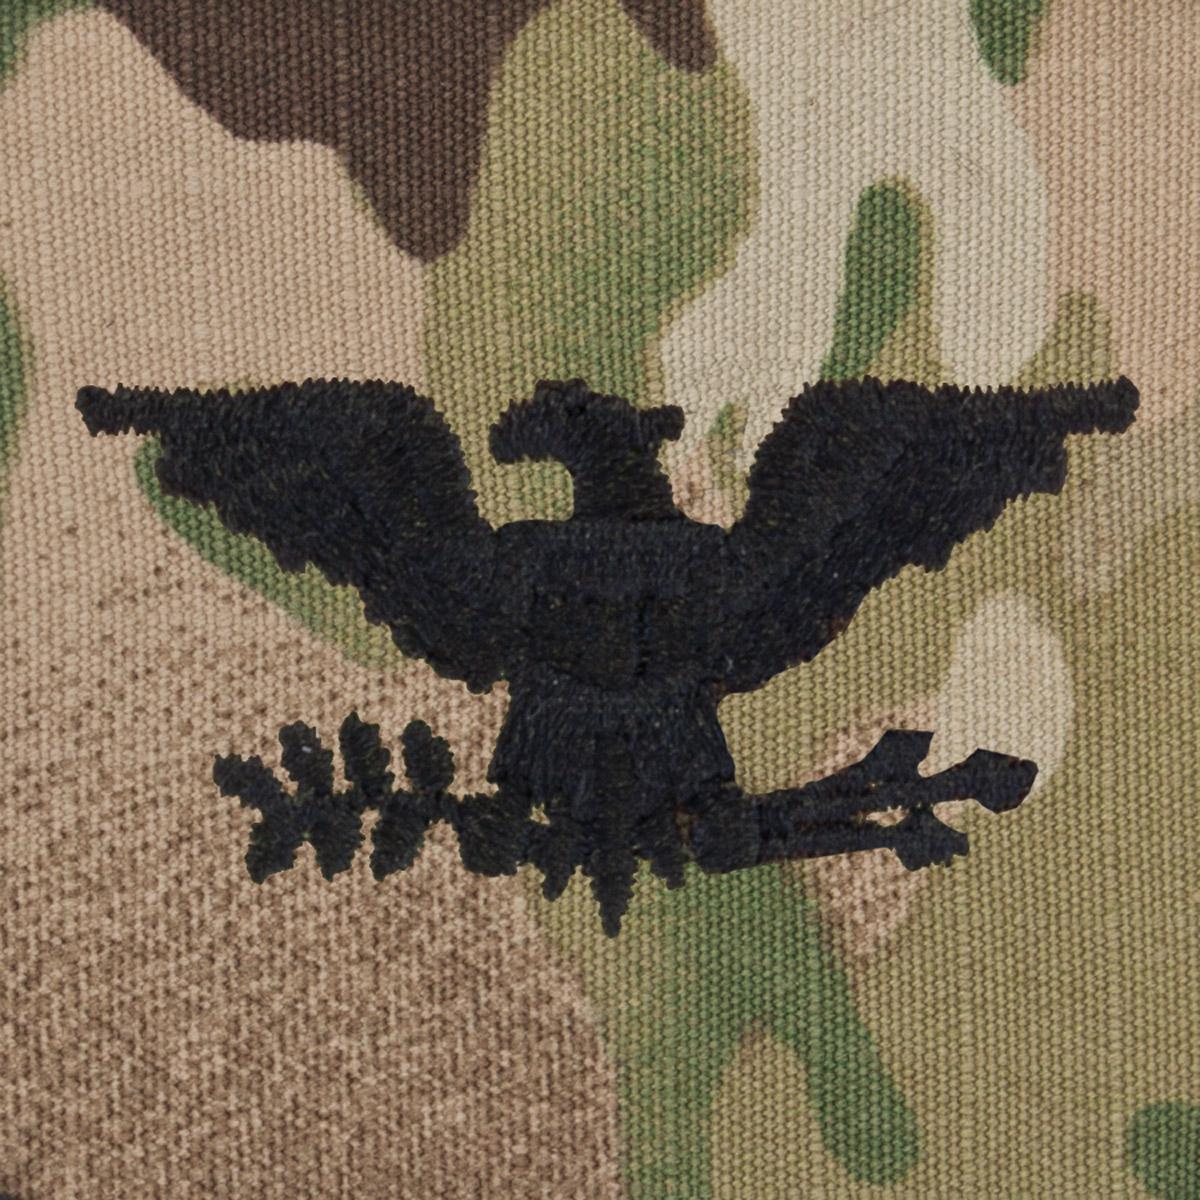 SVR-221, Colonel (COL), Scorpion Sew-On 2x2 Rank | US Military